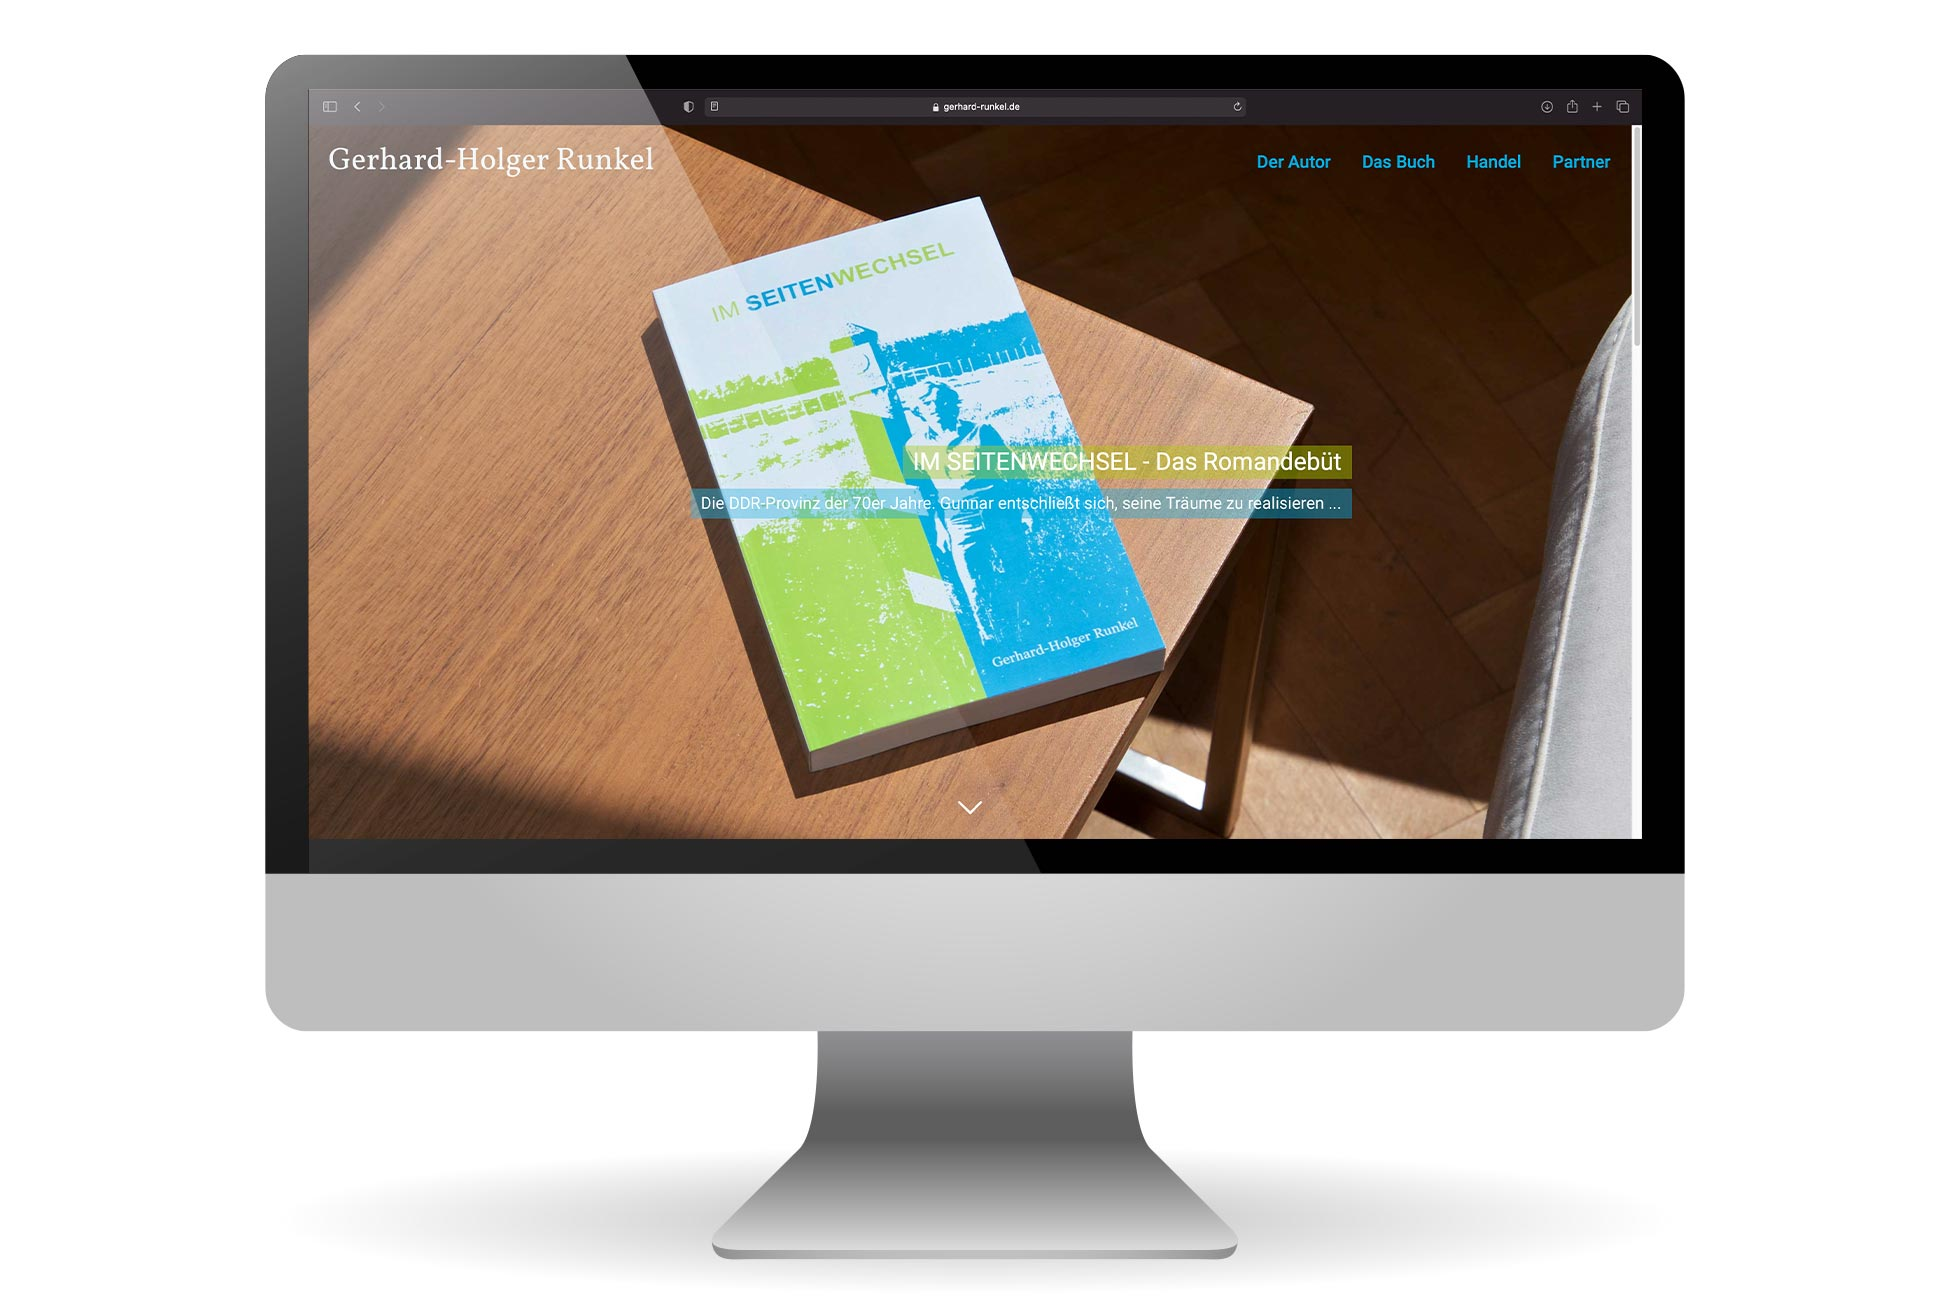 Gerhard-Holger Runkel Autorenwebsite